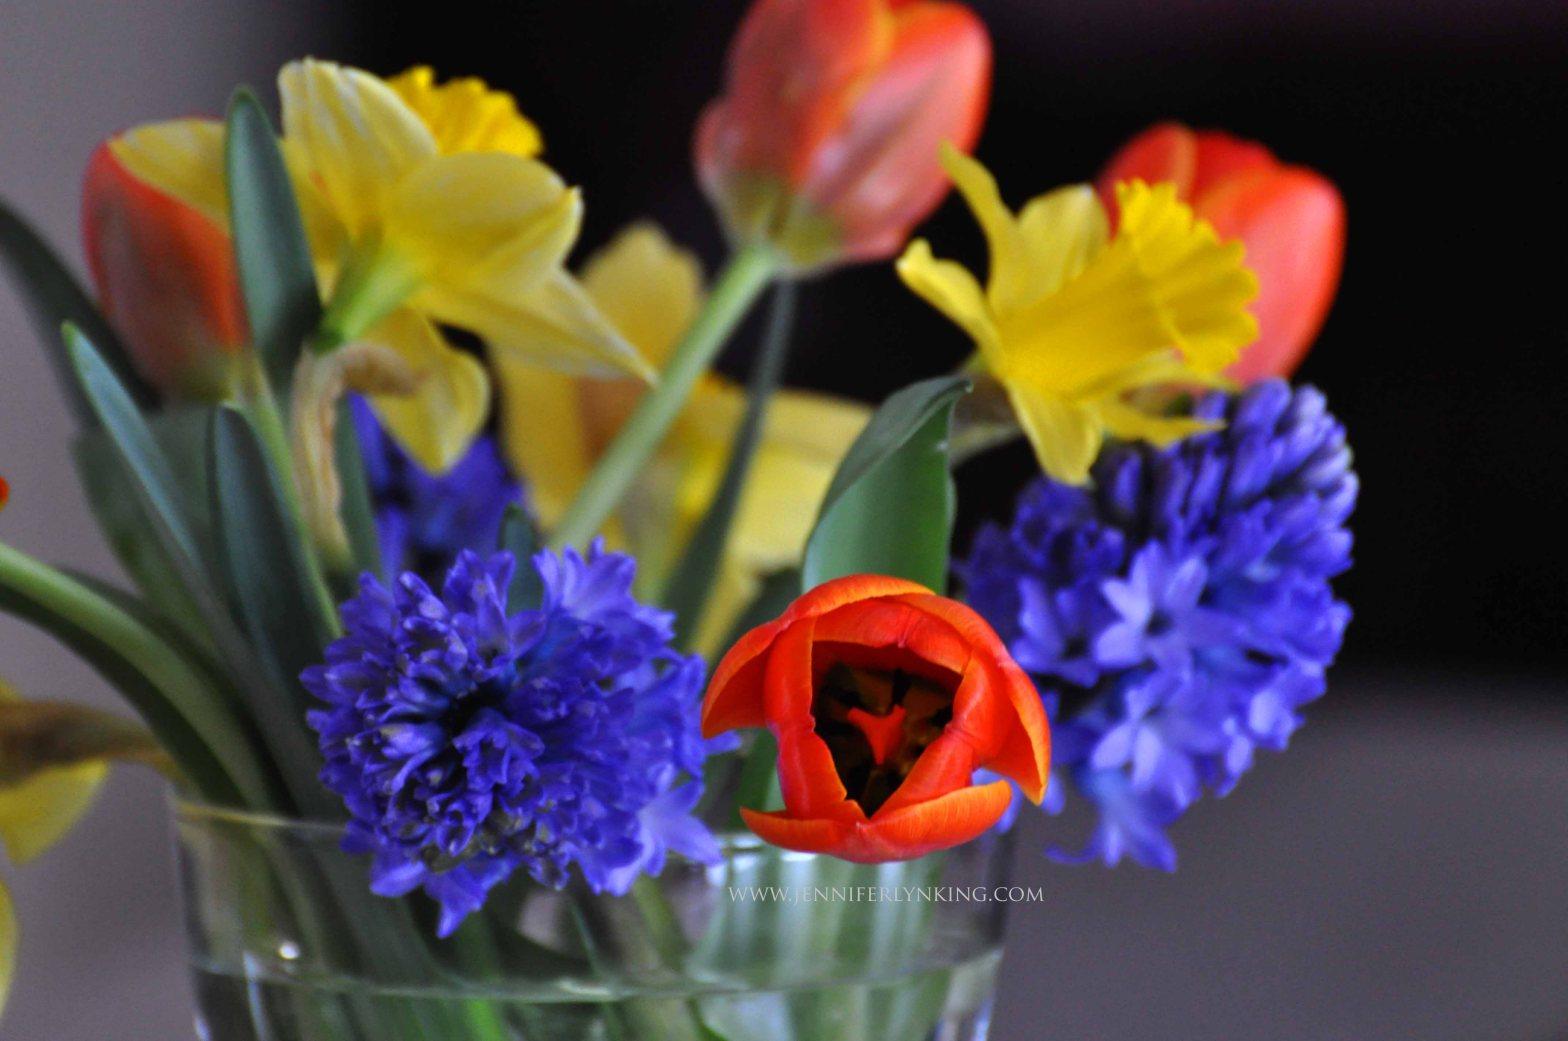 Daffodils, Hyacinths, and Tulips